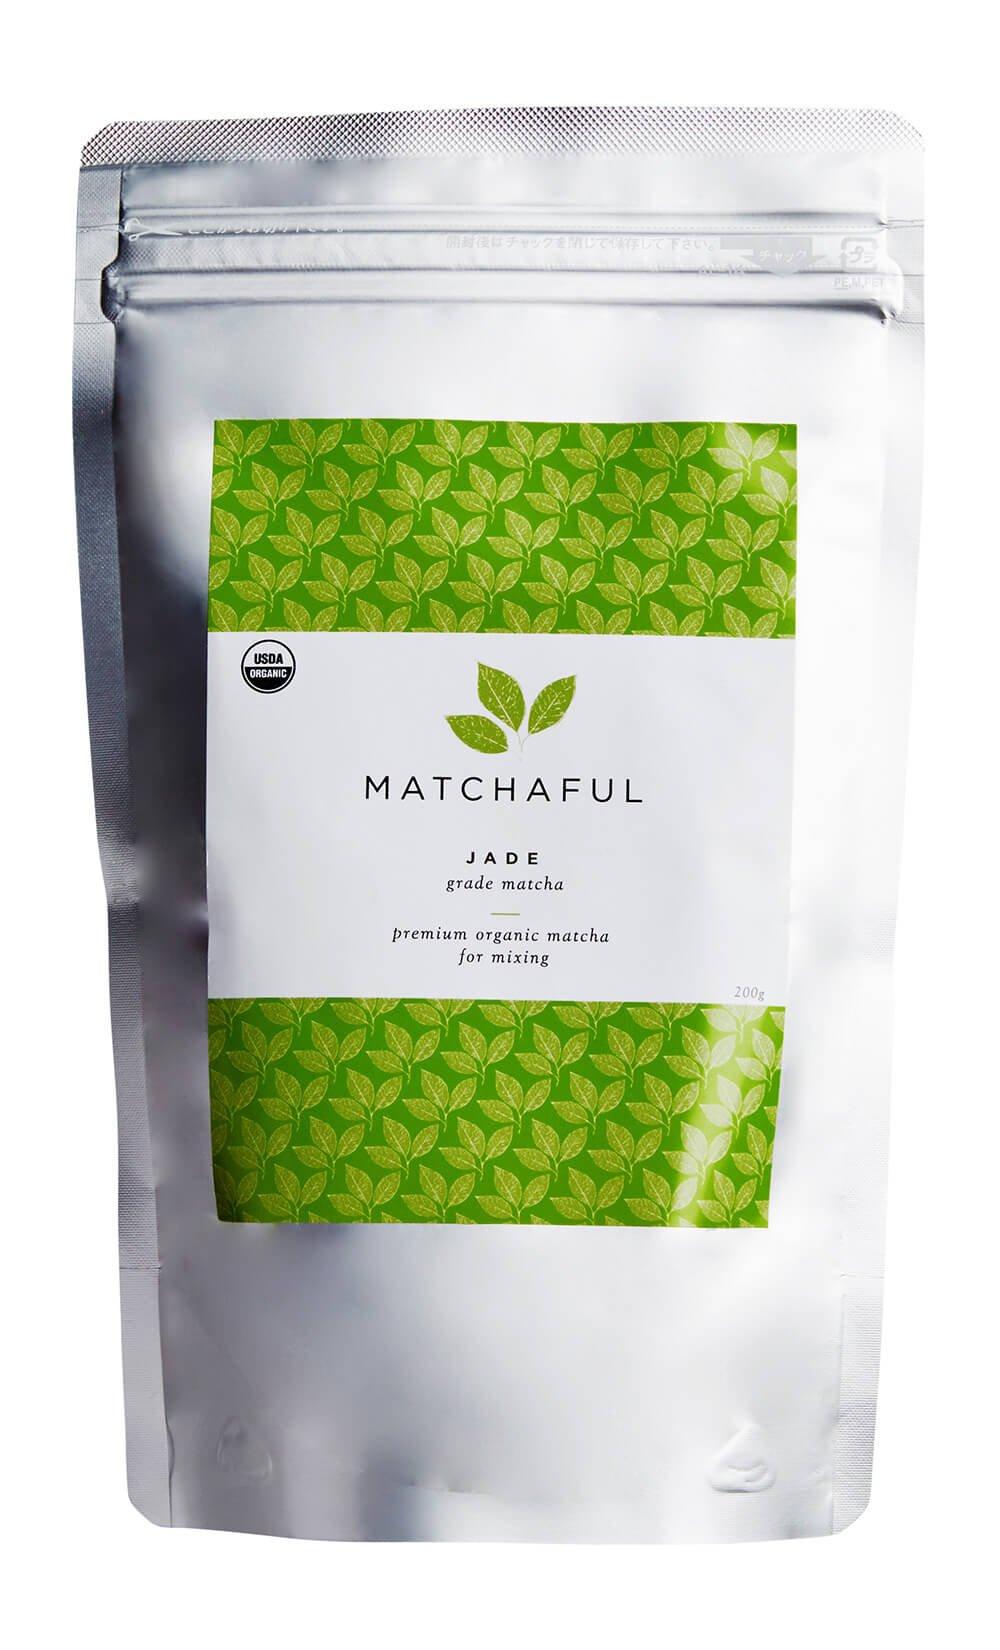 MATCHAFUL Jade Premium USDA Organic Culinary Matcha, 200 Gram